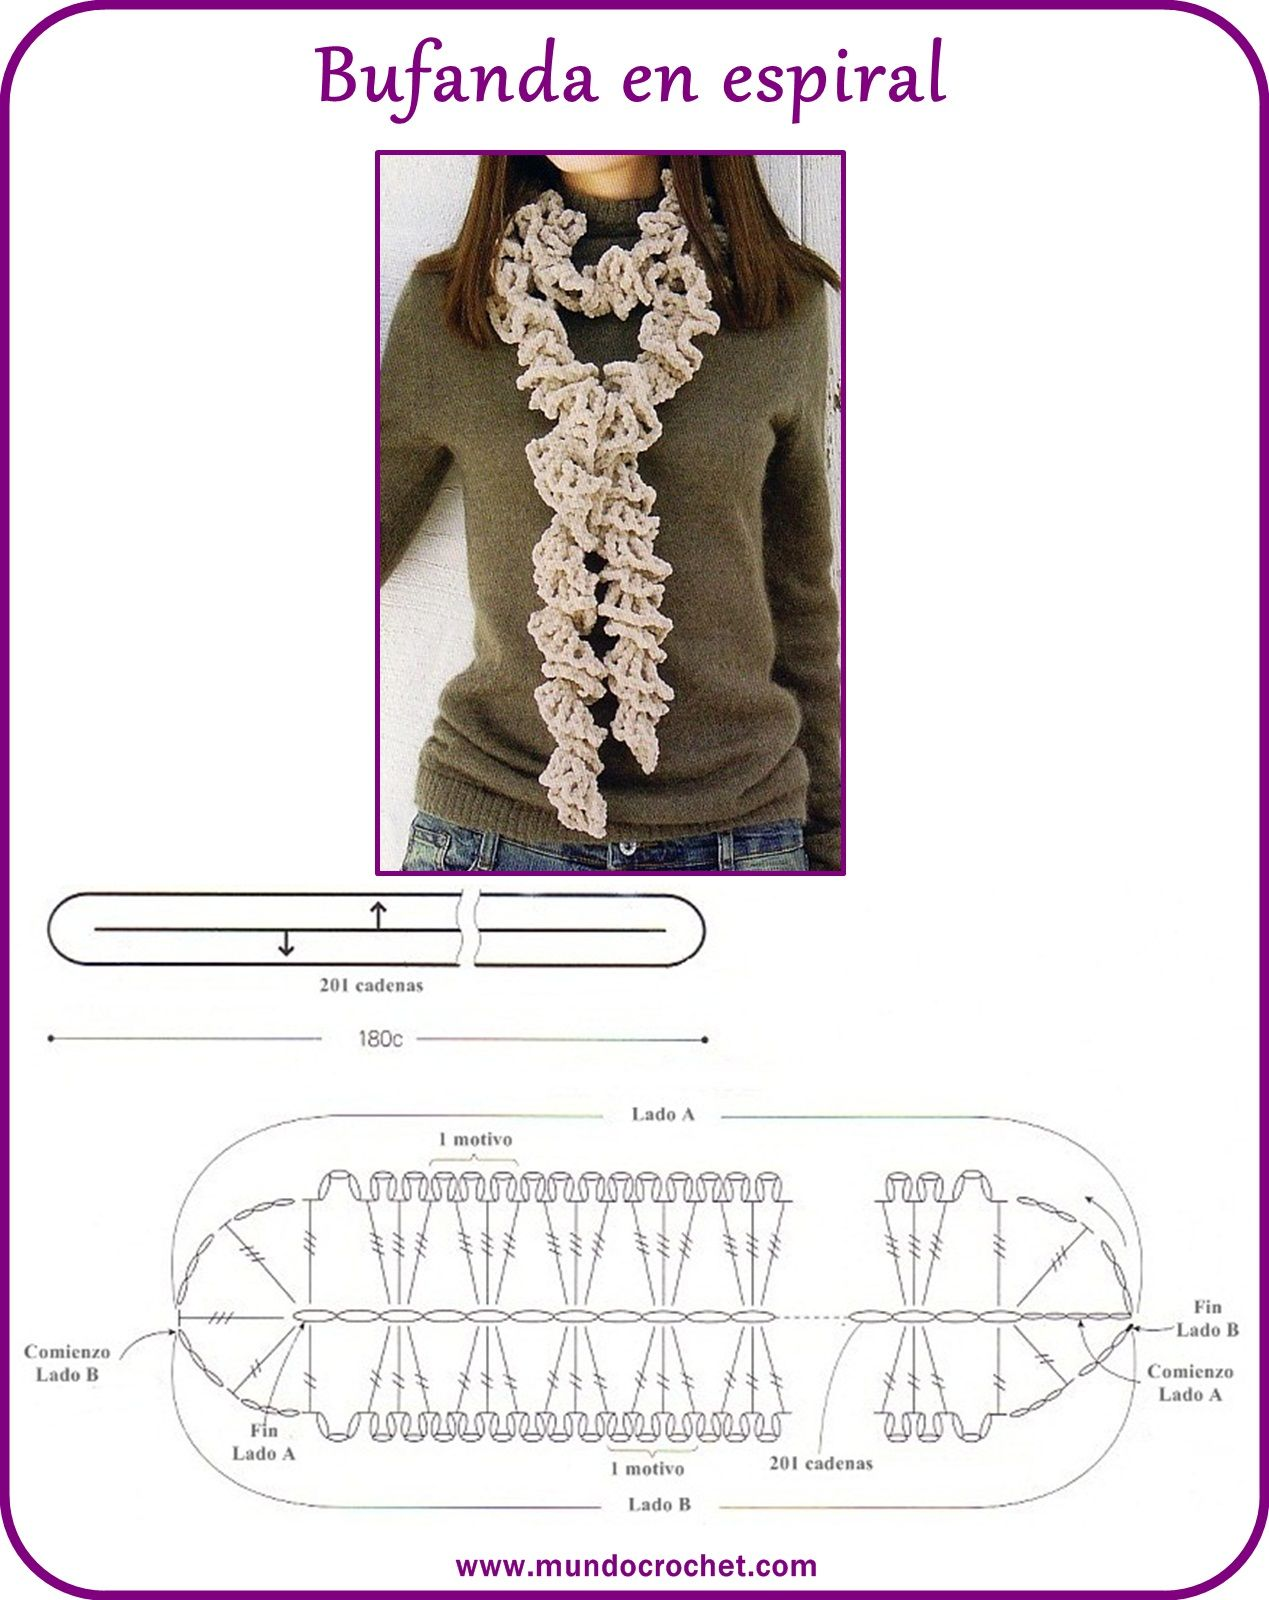 Bufanda crochet espiral | crochet shawls & accessories | Pinterest ...